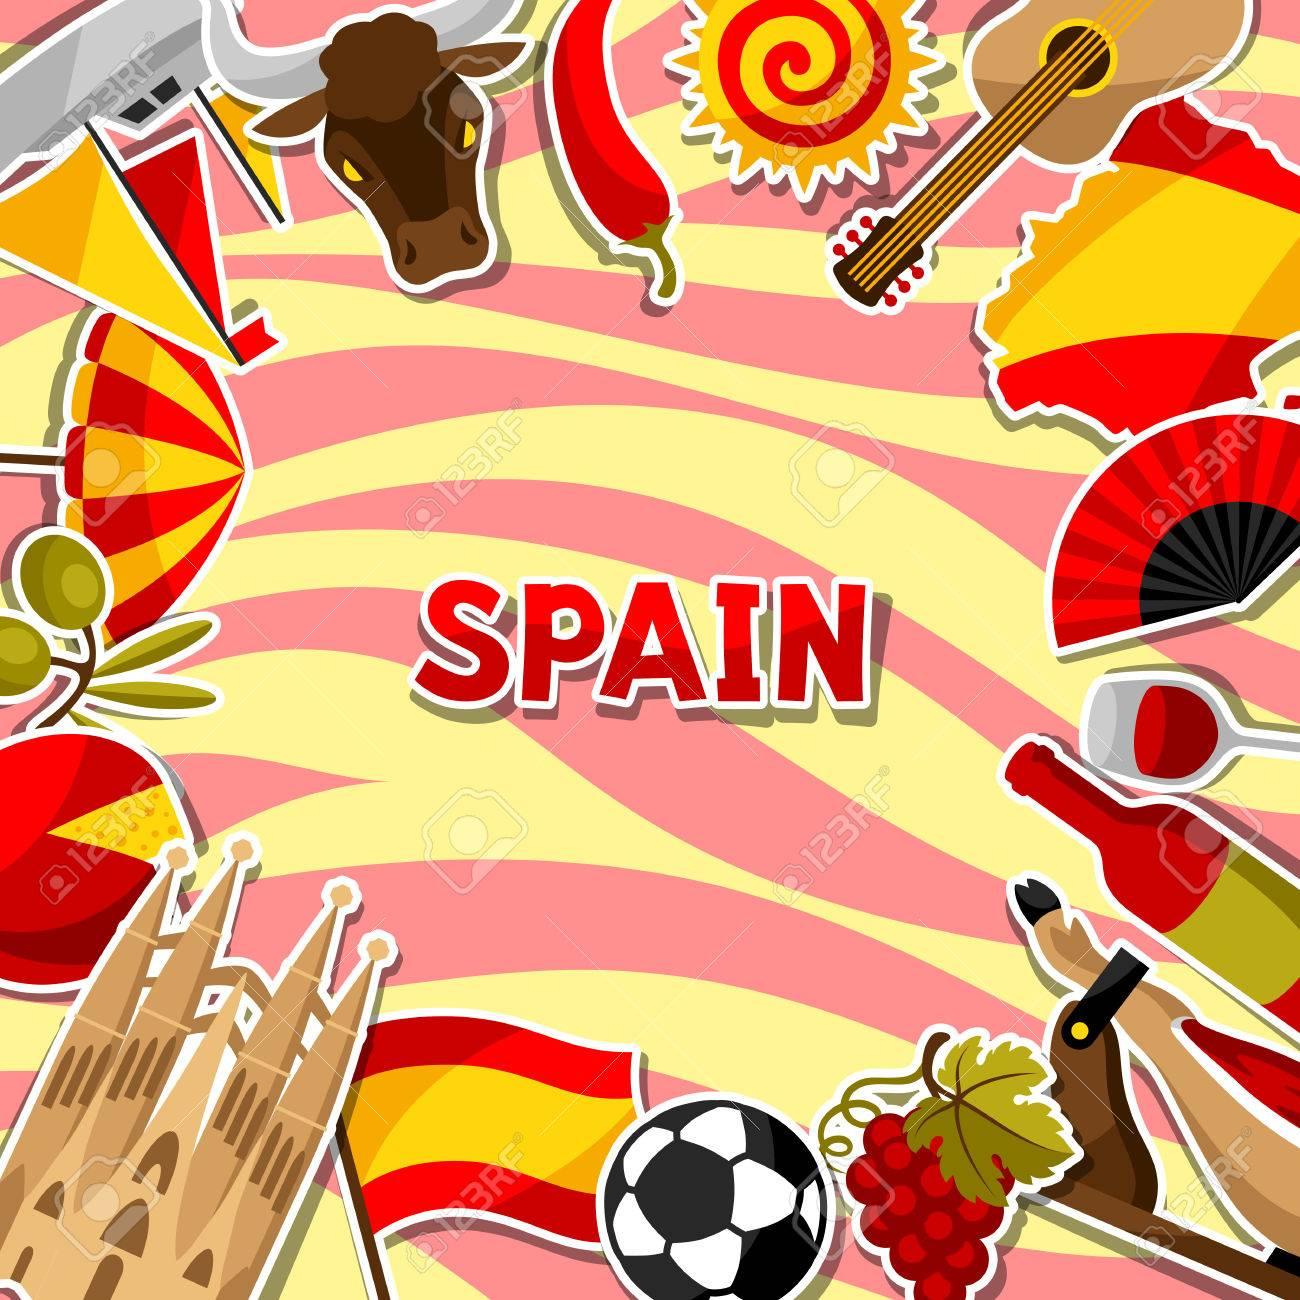 Spain background design spanish traditional sticker symbols spain background design spanish traditional sticker symbols and objects stock vector 76742887 voltagebd Gallery